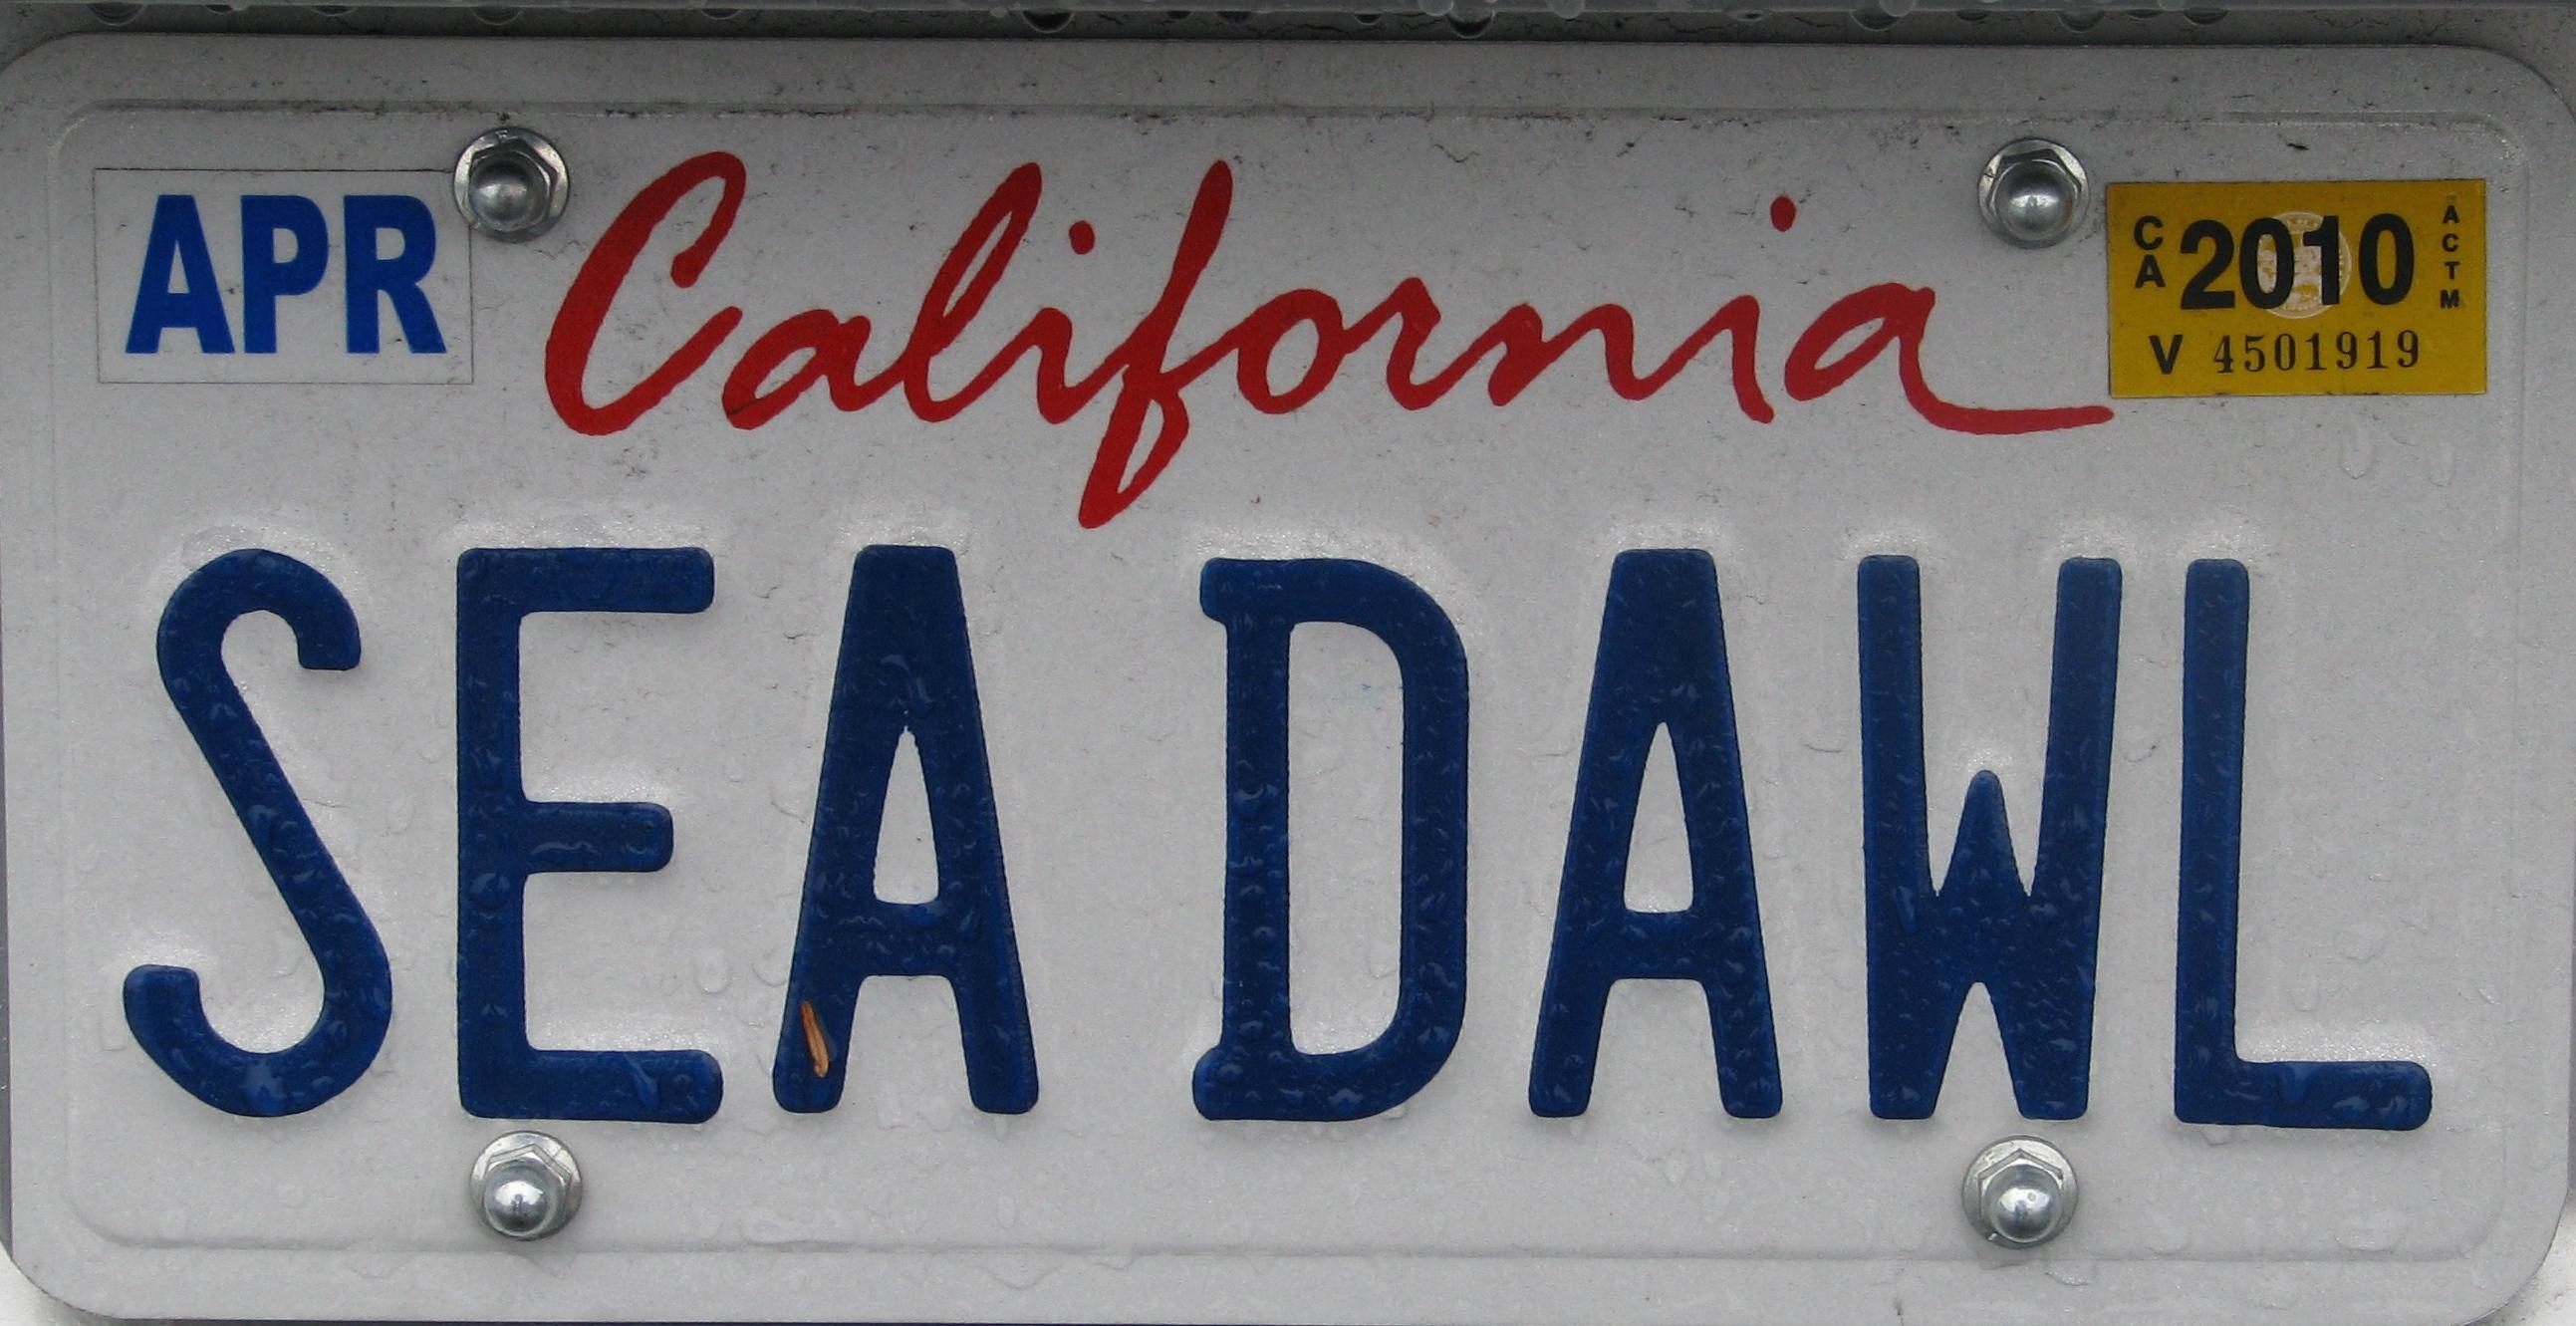 CA.SEADAWL.JPG